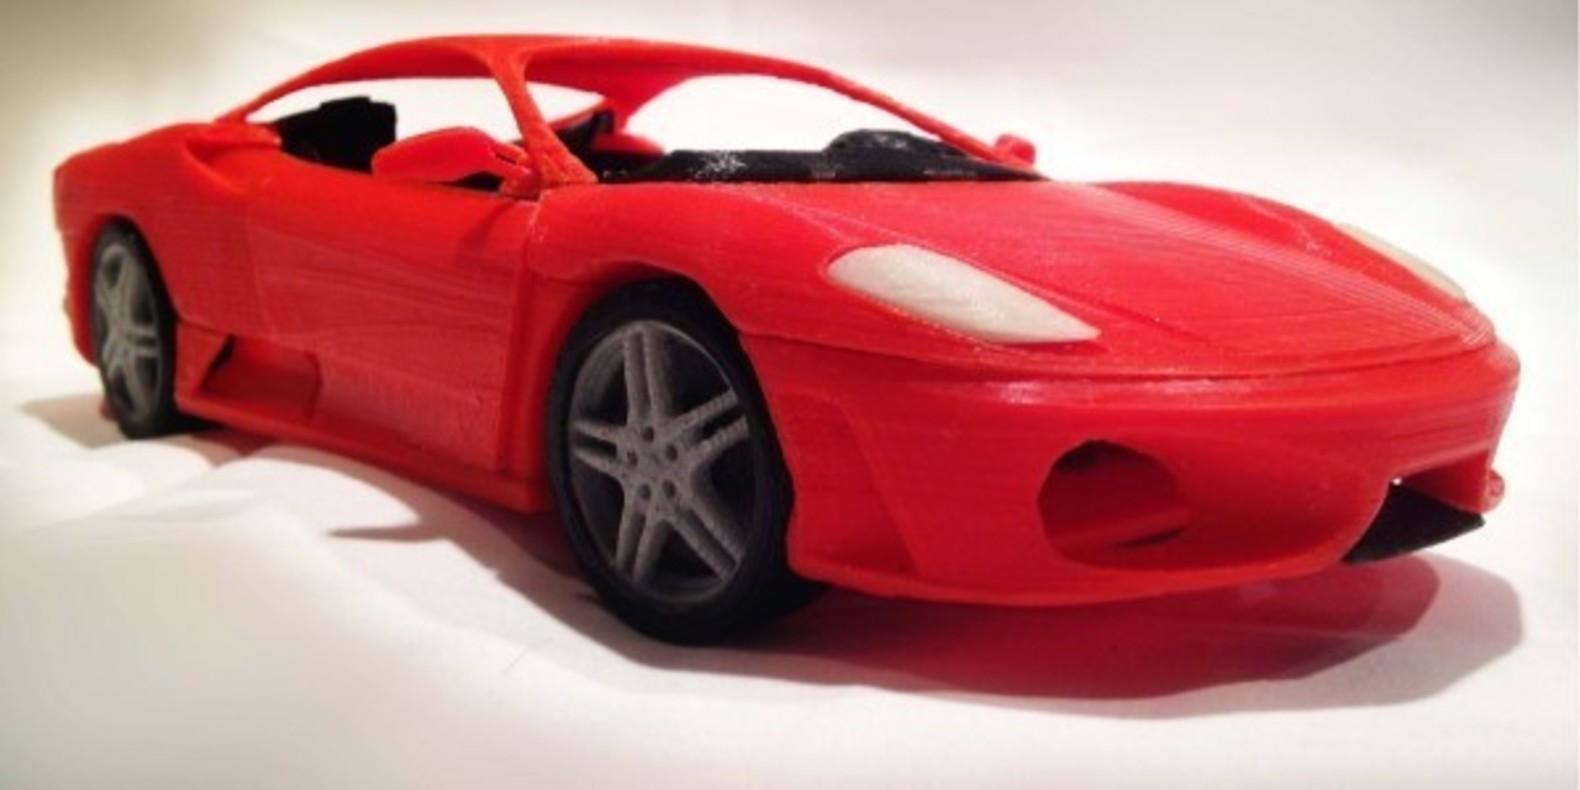 Italian Sports Car 1 - Mao Casella - Cults modélisme 3D printing Impression 3D Fichier 3D